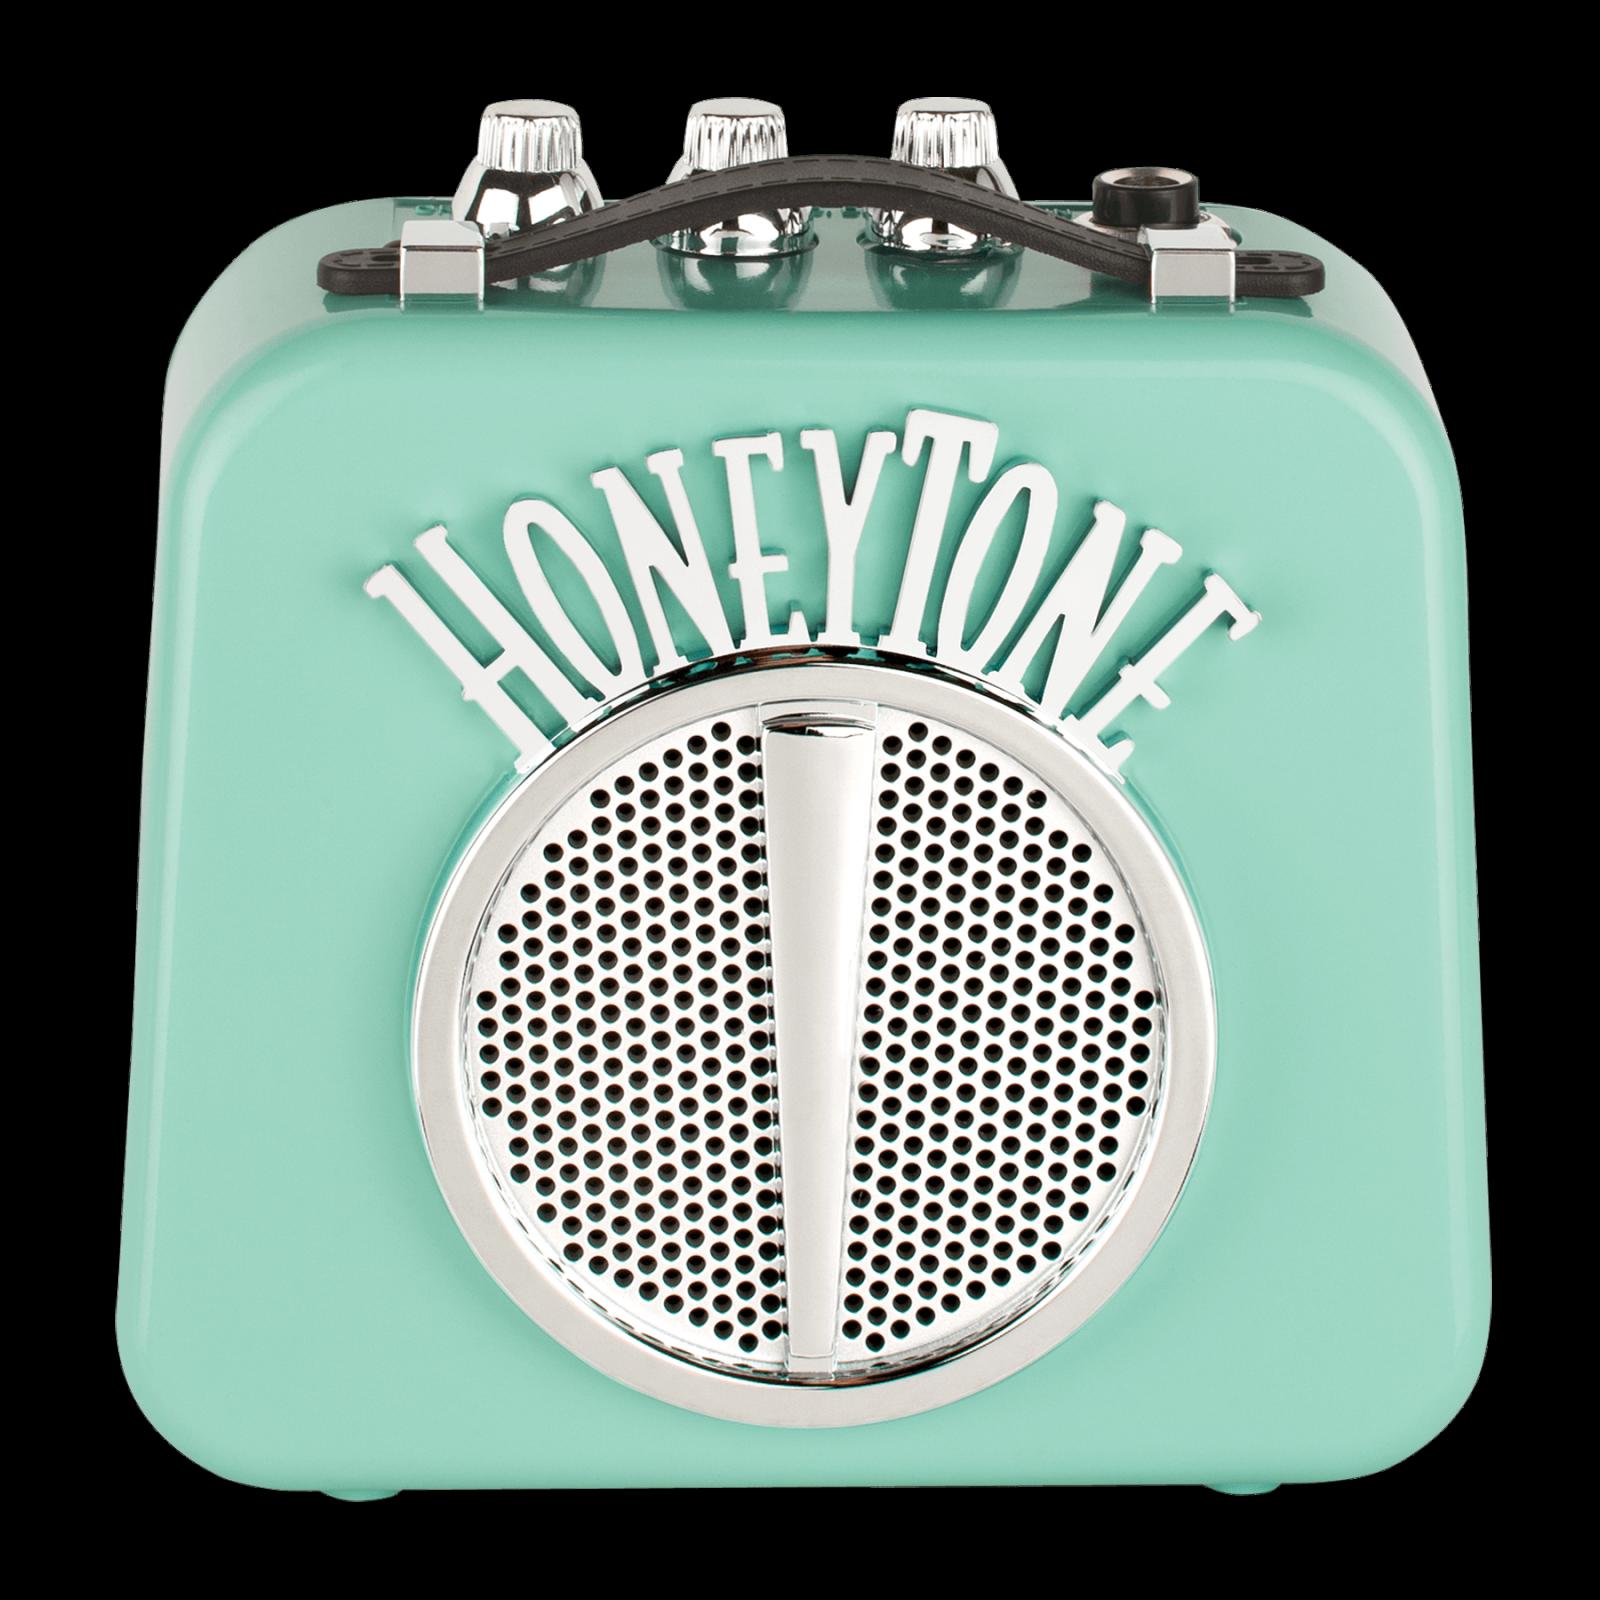 DANELECTRO HONEYTONE N10A MINI GUITAR AMP BATTERY OPERATED AQUA